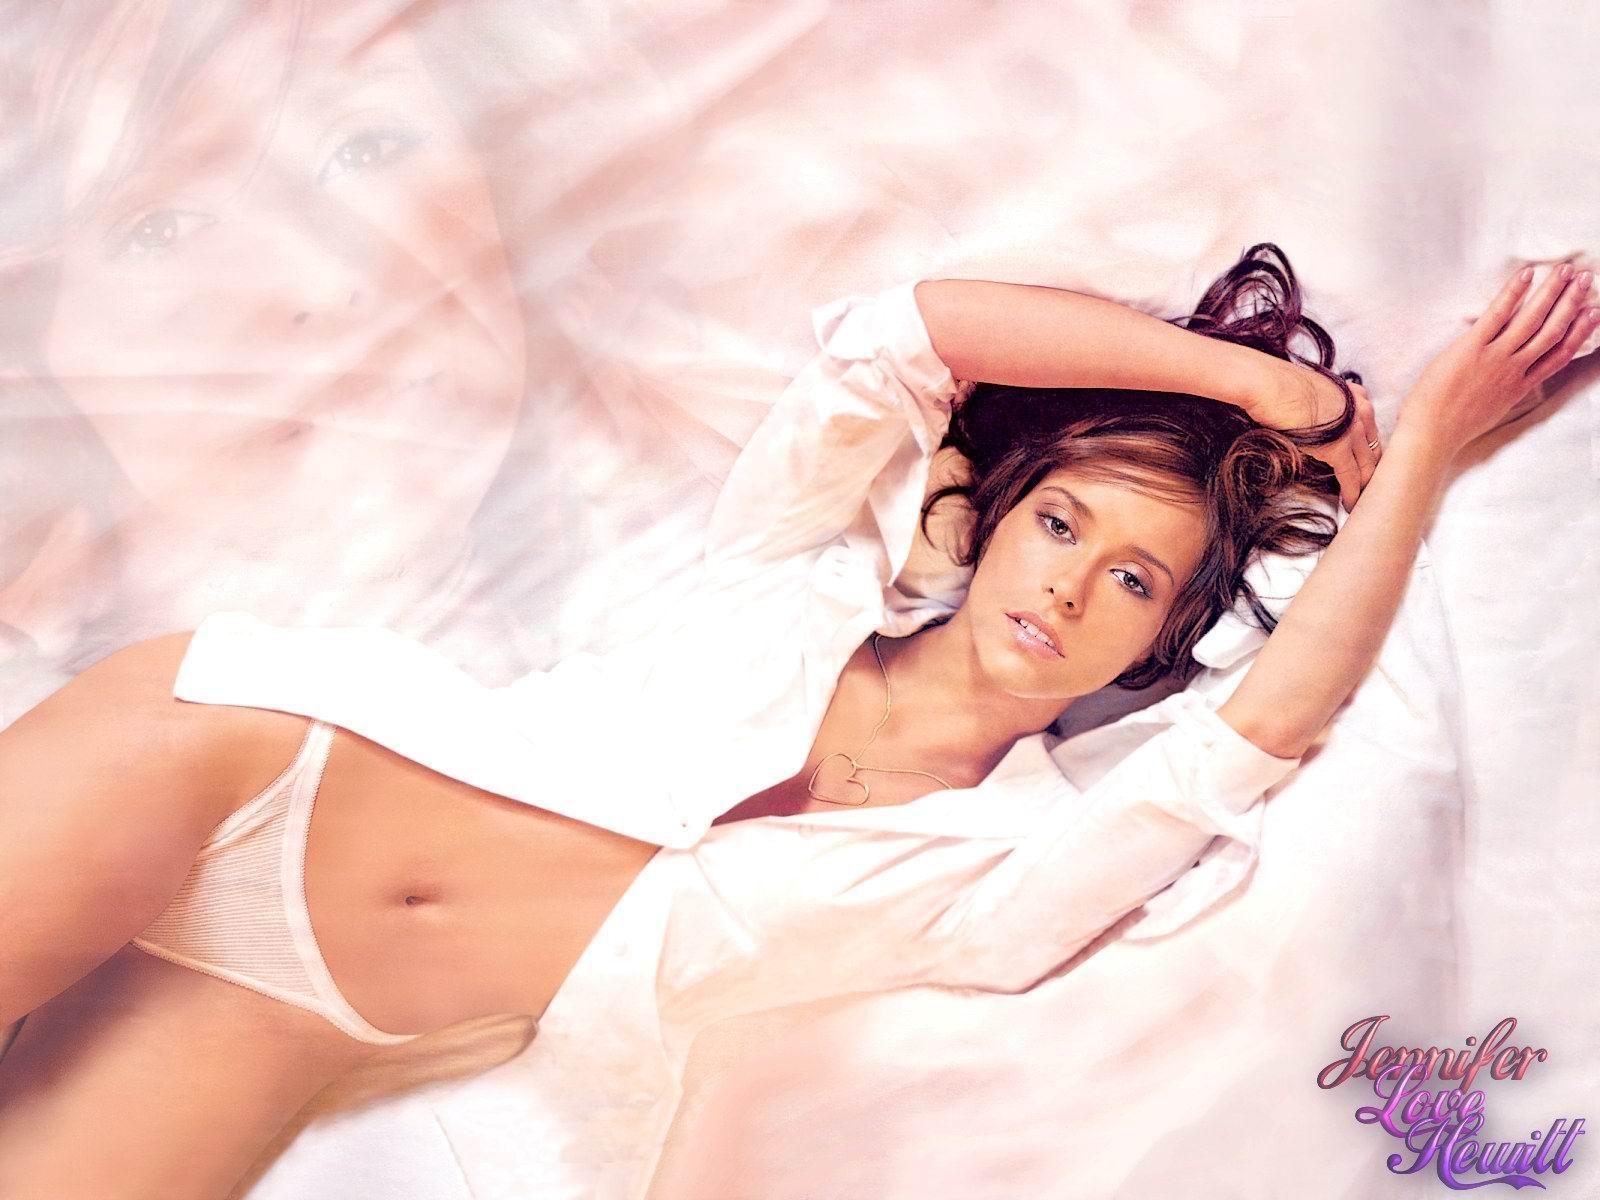 Jennifer Love Hewitt Nude in a Perfect